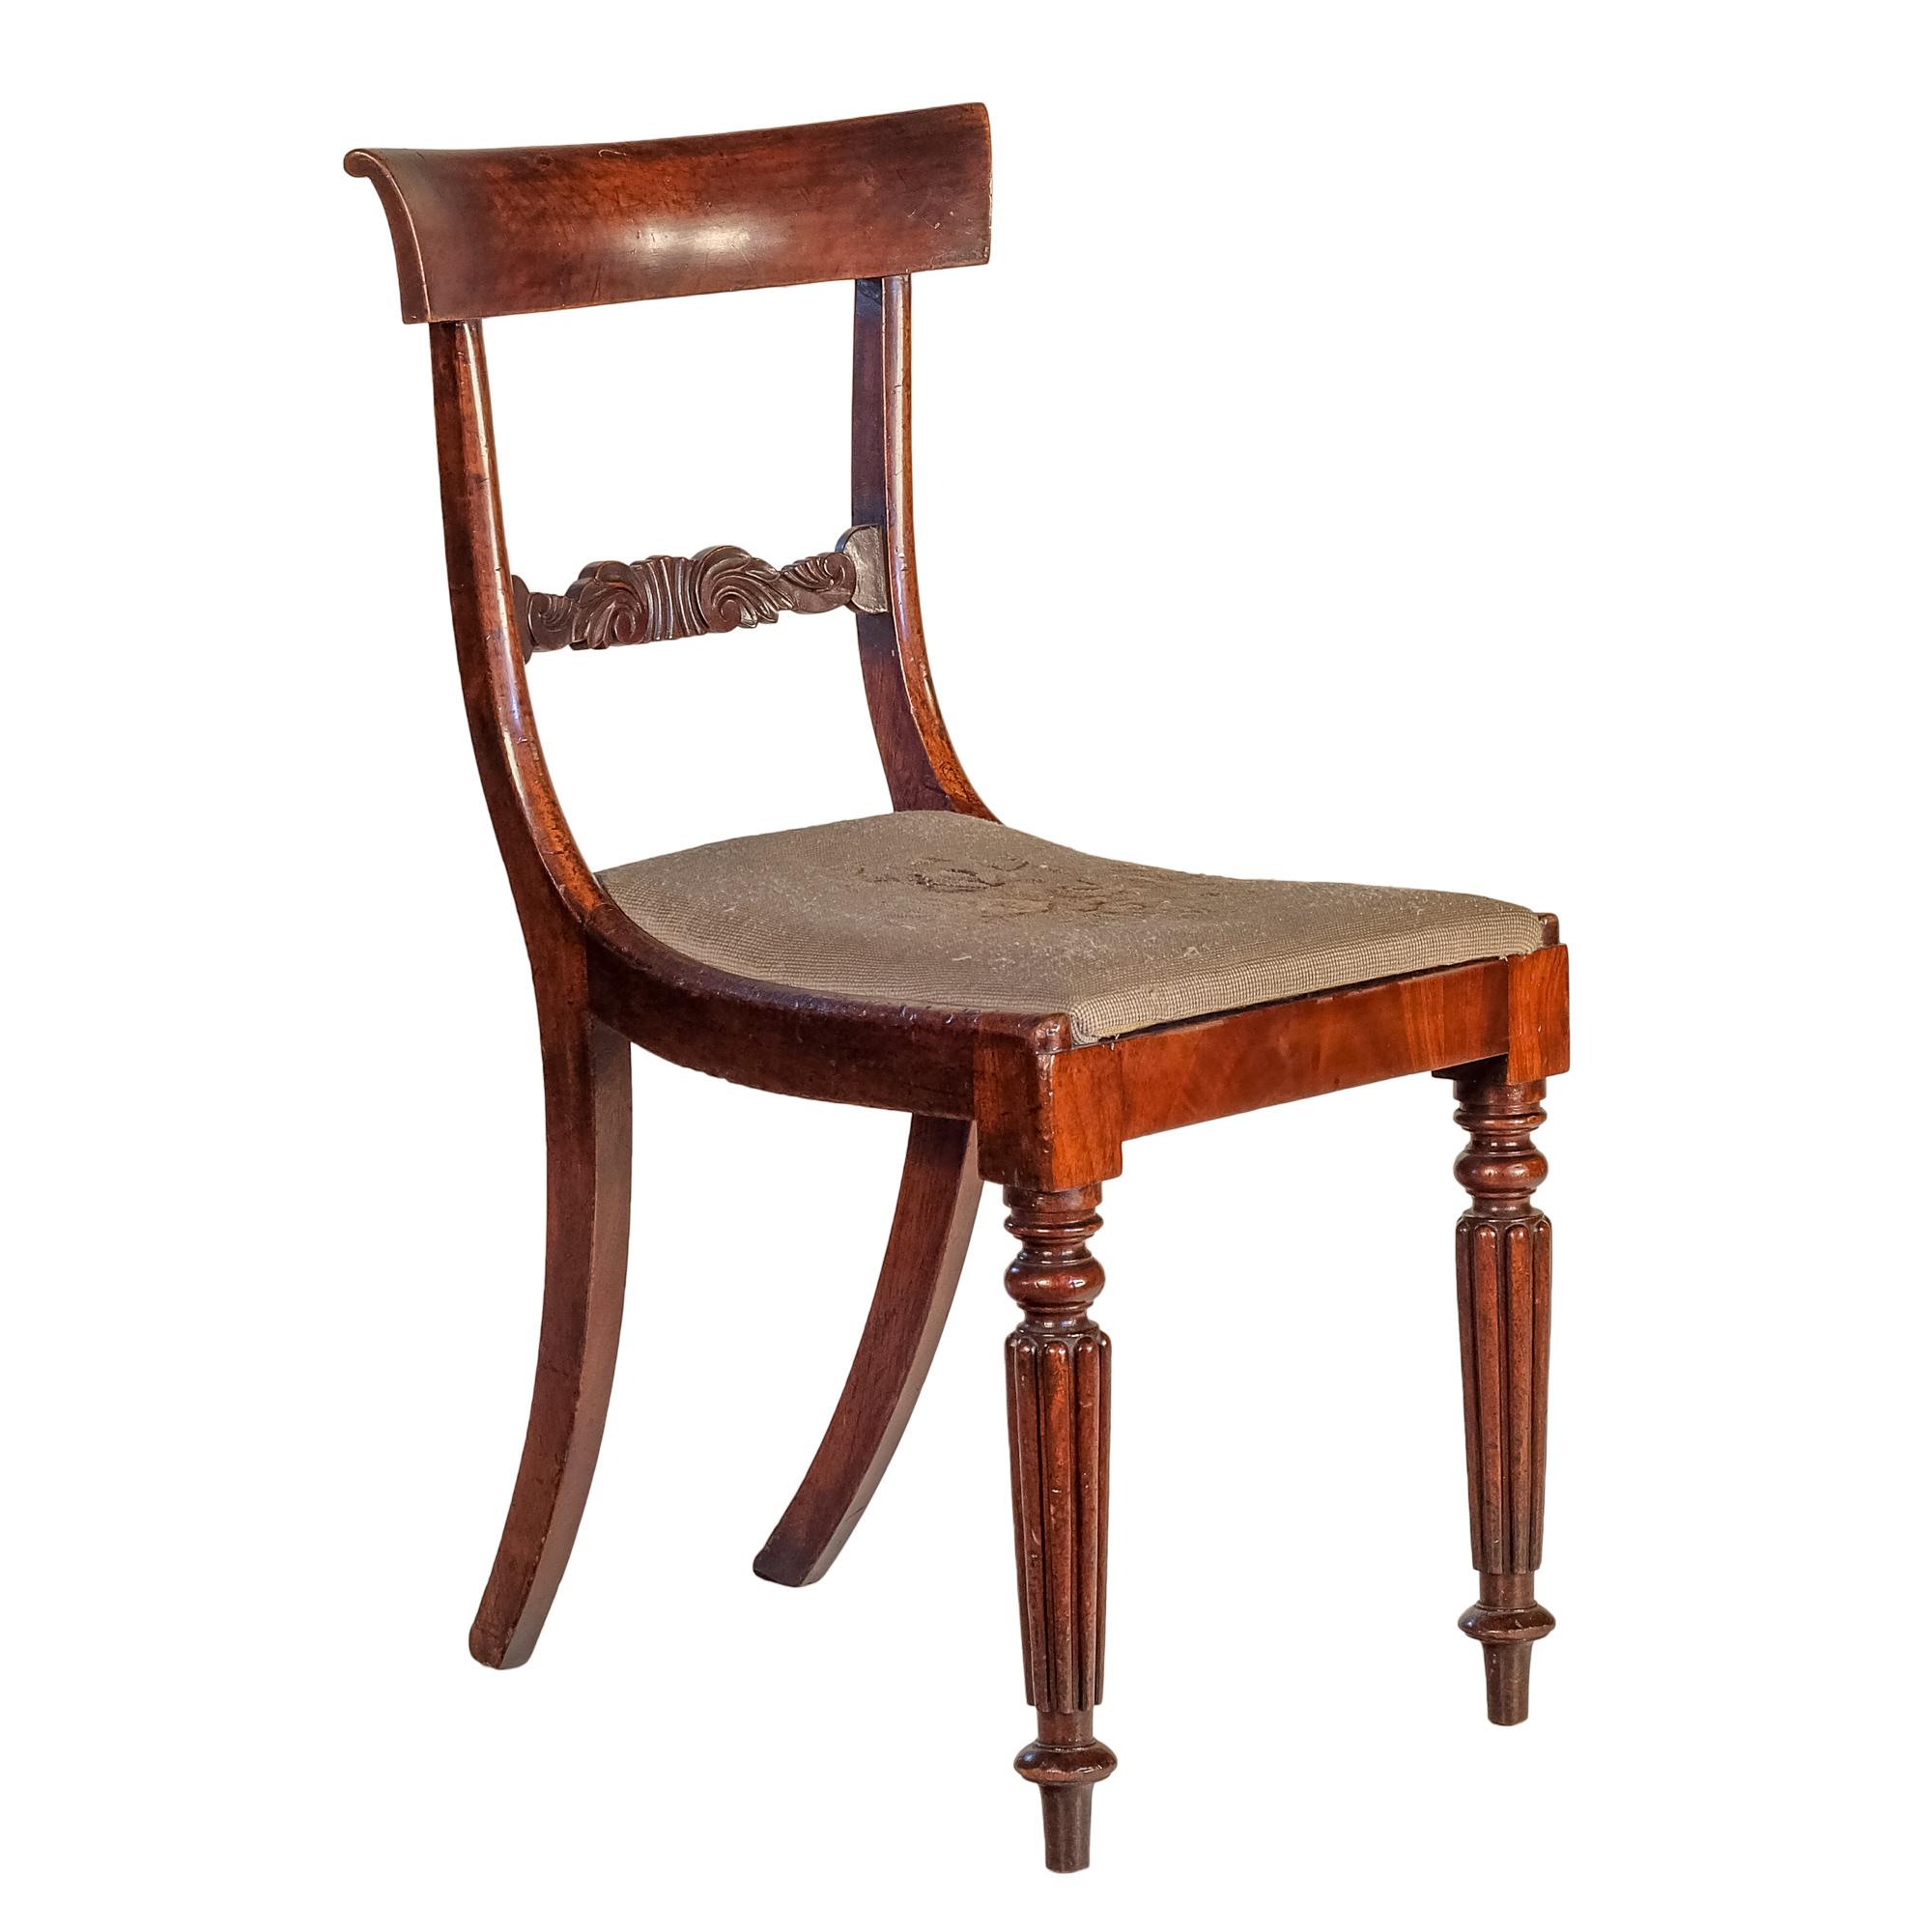 'William IV Mahogany Dining Chair Circa 1835'